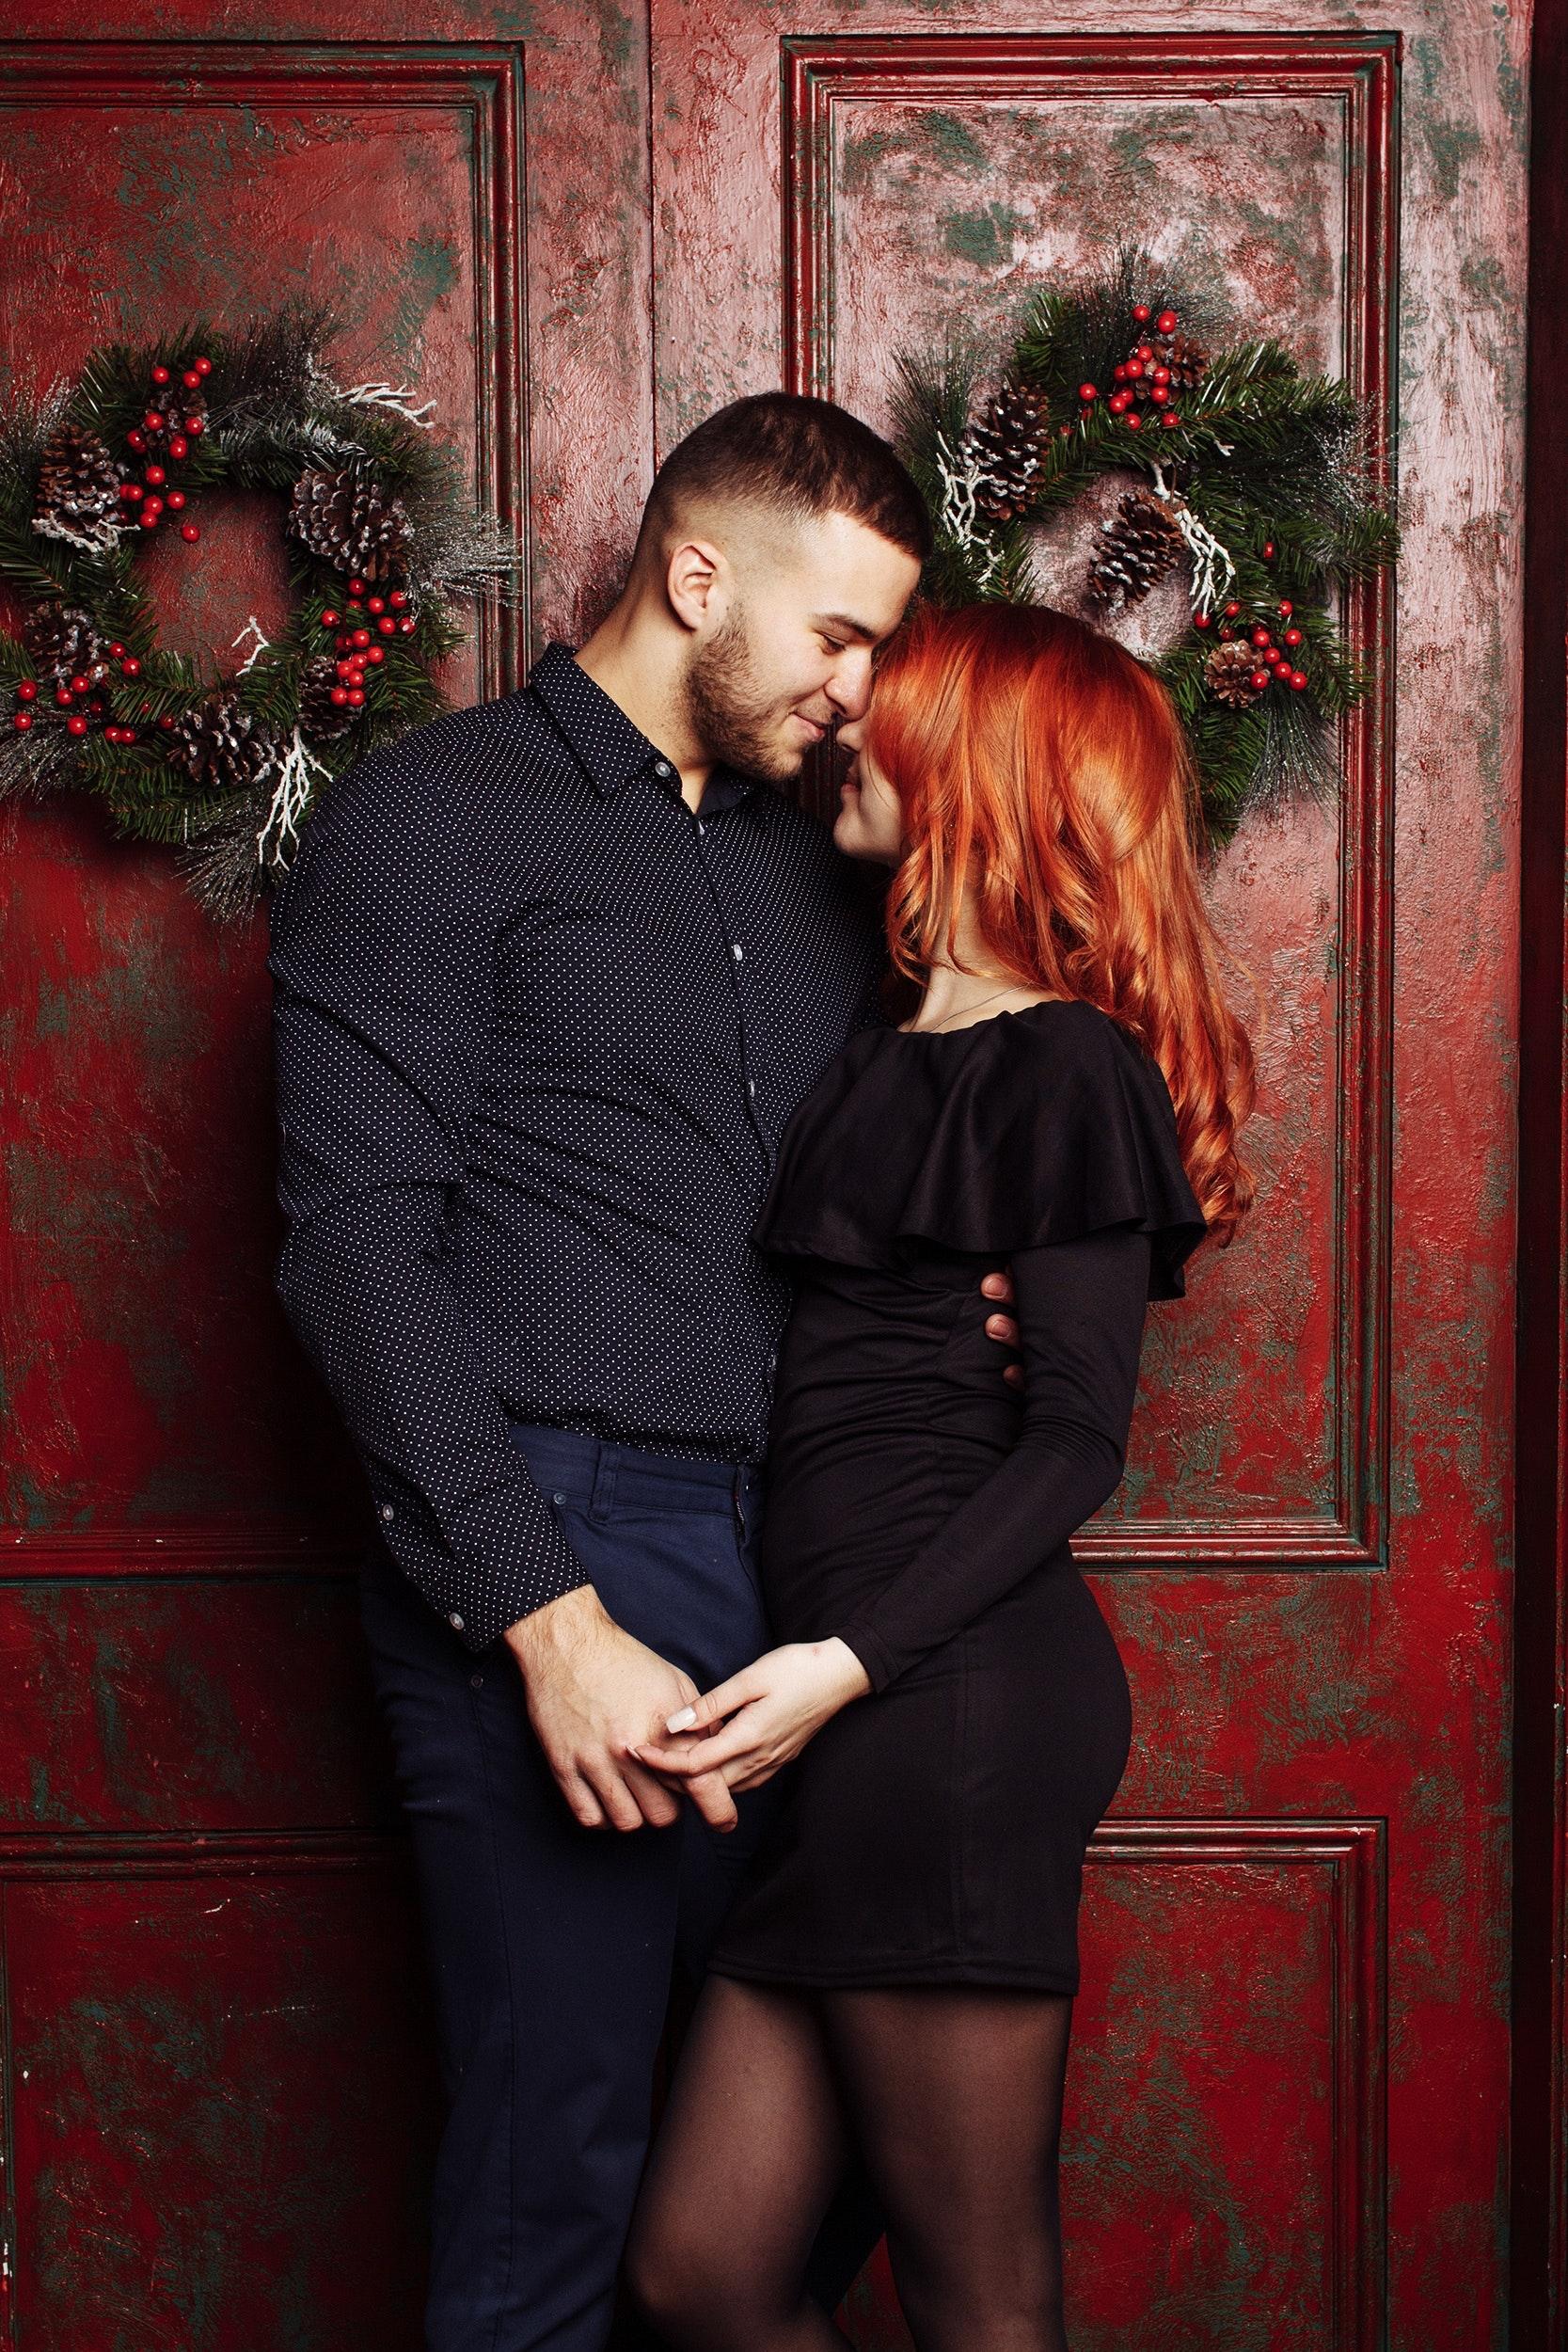 Beautiful Young Couple, Adult, Photoshoot, Woman, Wear, HQ Photo